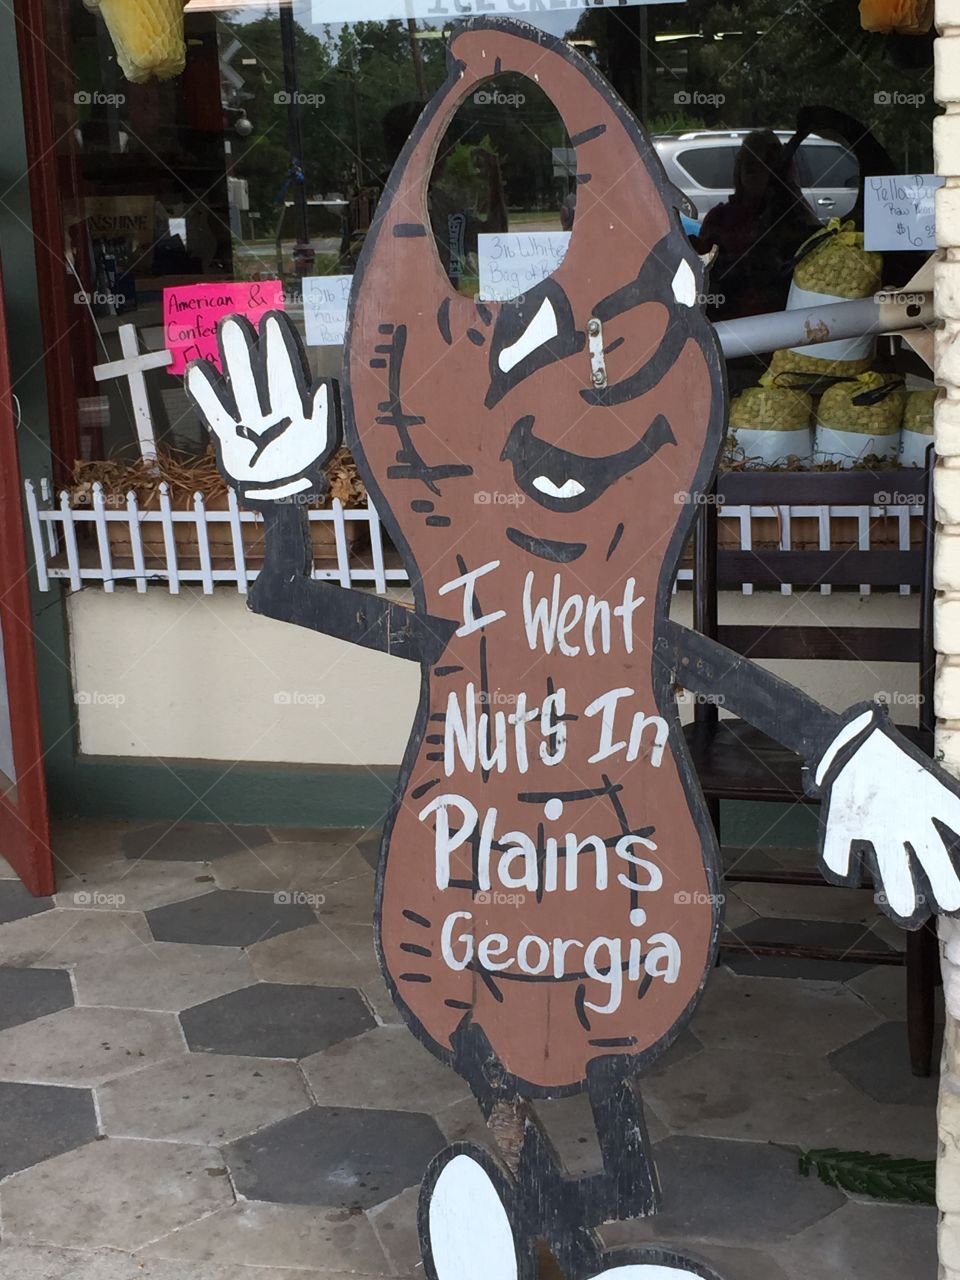 Georgia peanut sign in the city of Plains, Georgia outside of a novelty store with Plains peanut icecream and fudge inside.